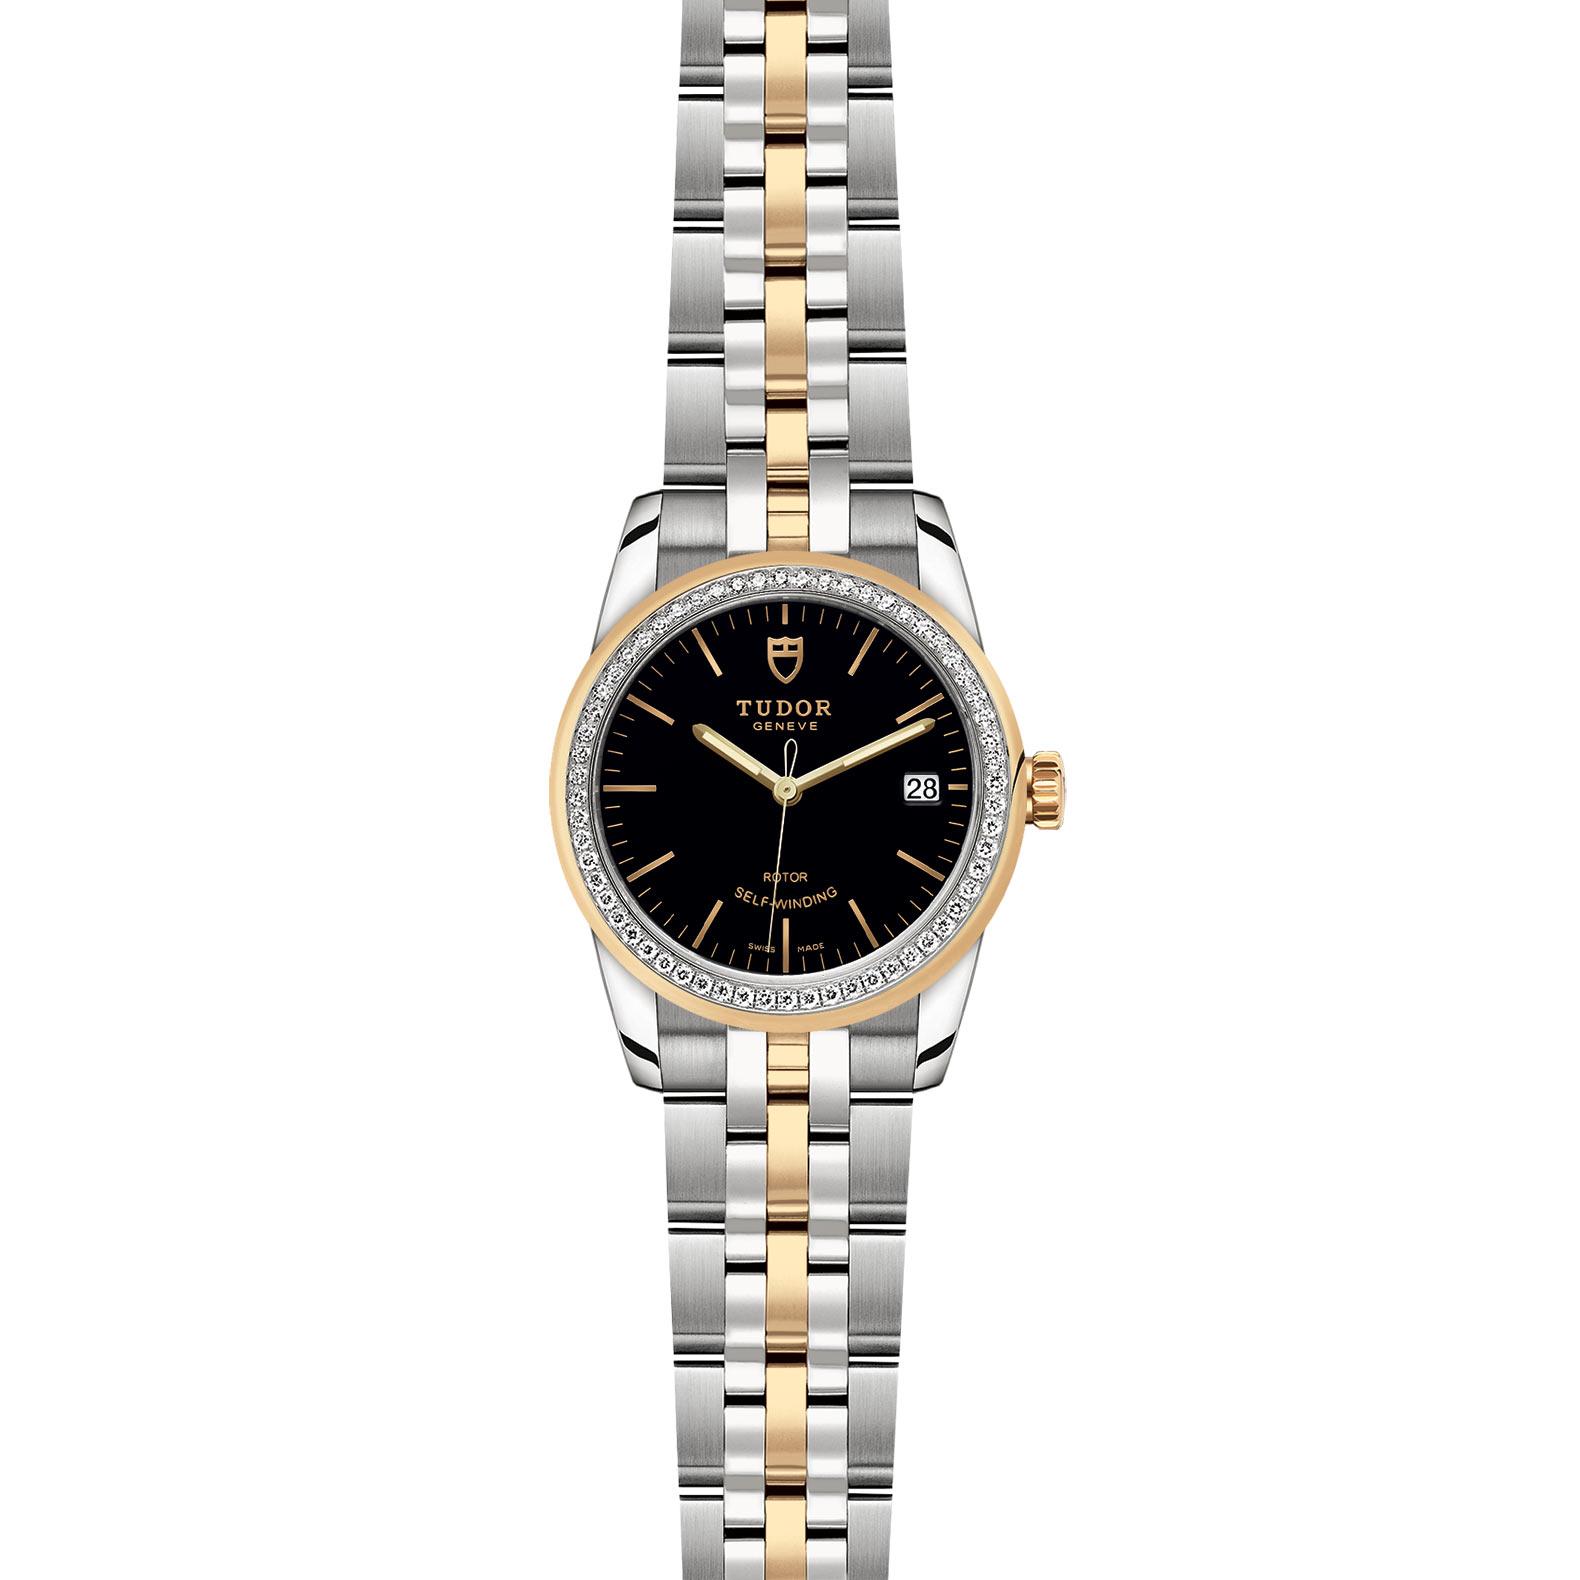 TUDOR Glamour Date M55023 0021 Frontfacing